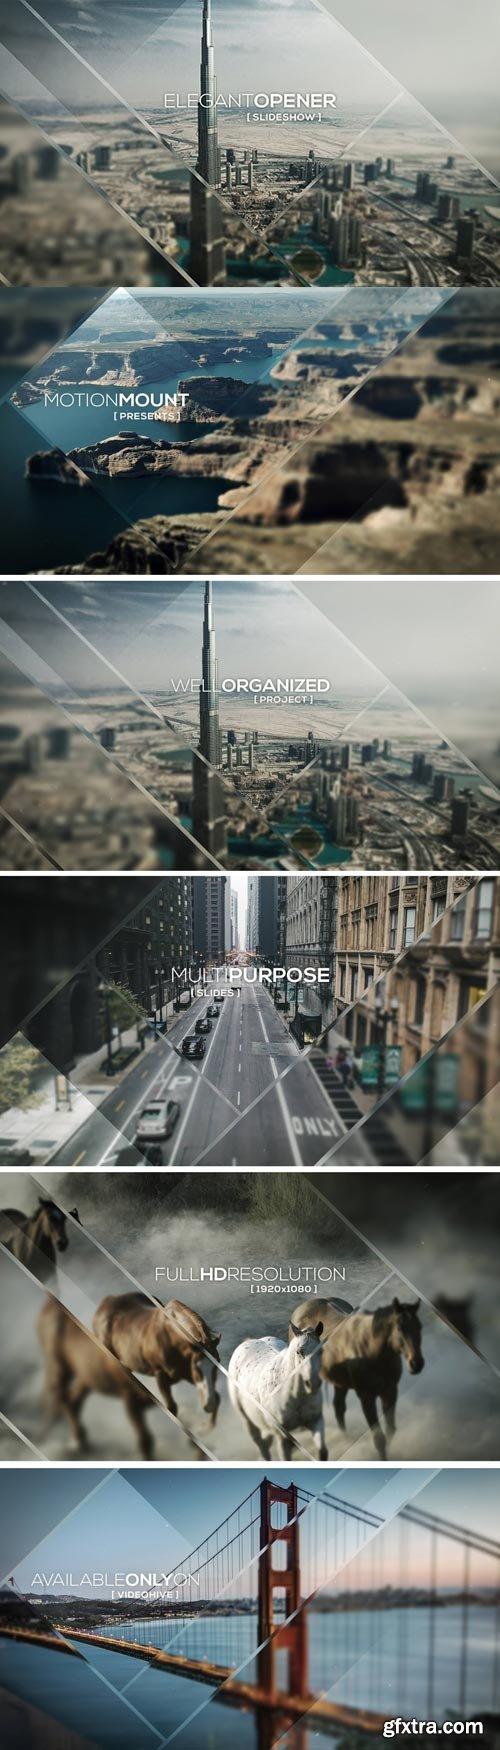 Videohive - Elegant Opener - Slideshow - 12323985